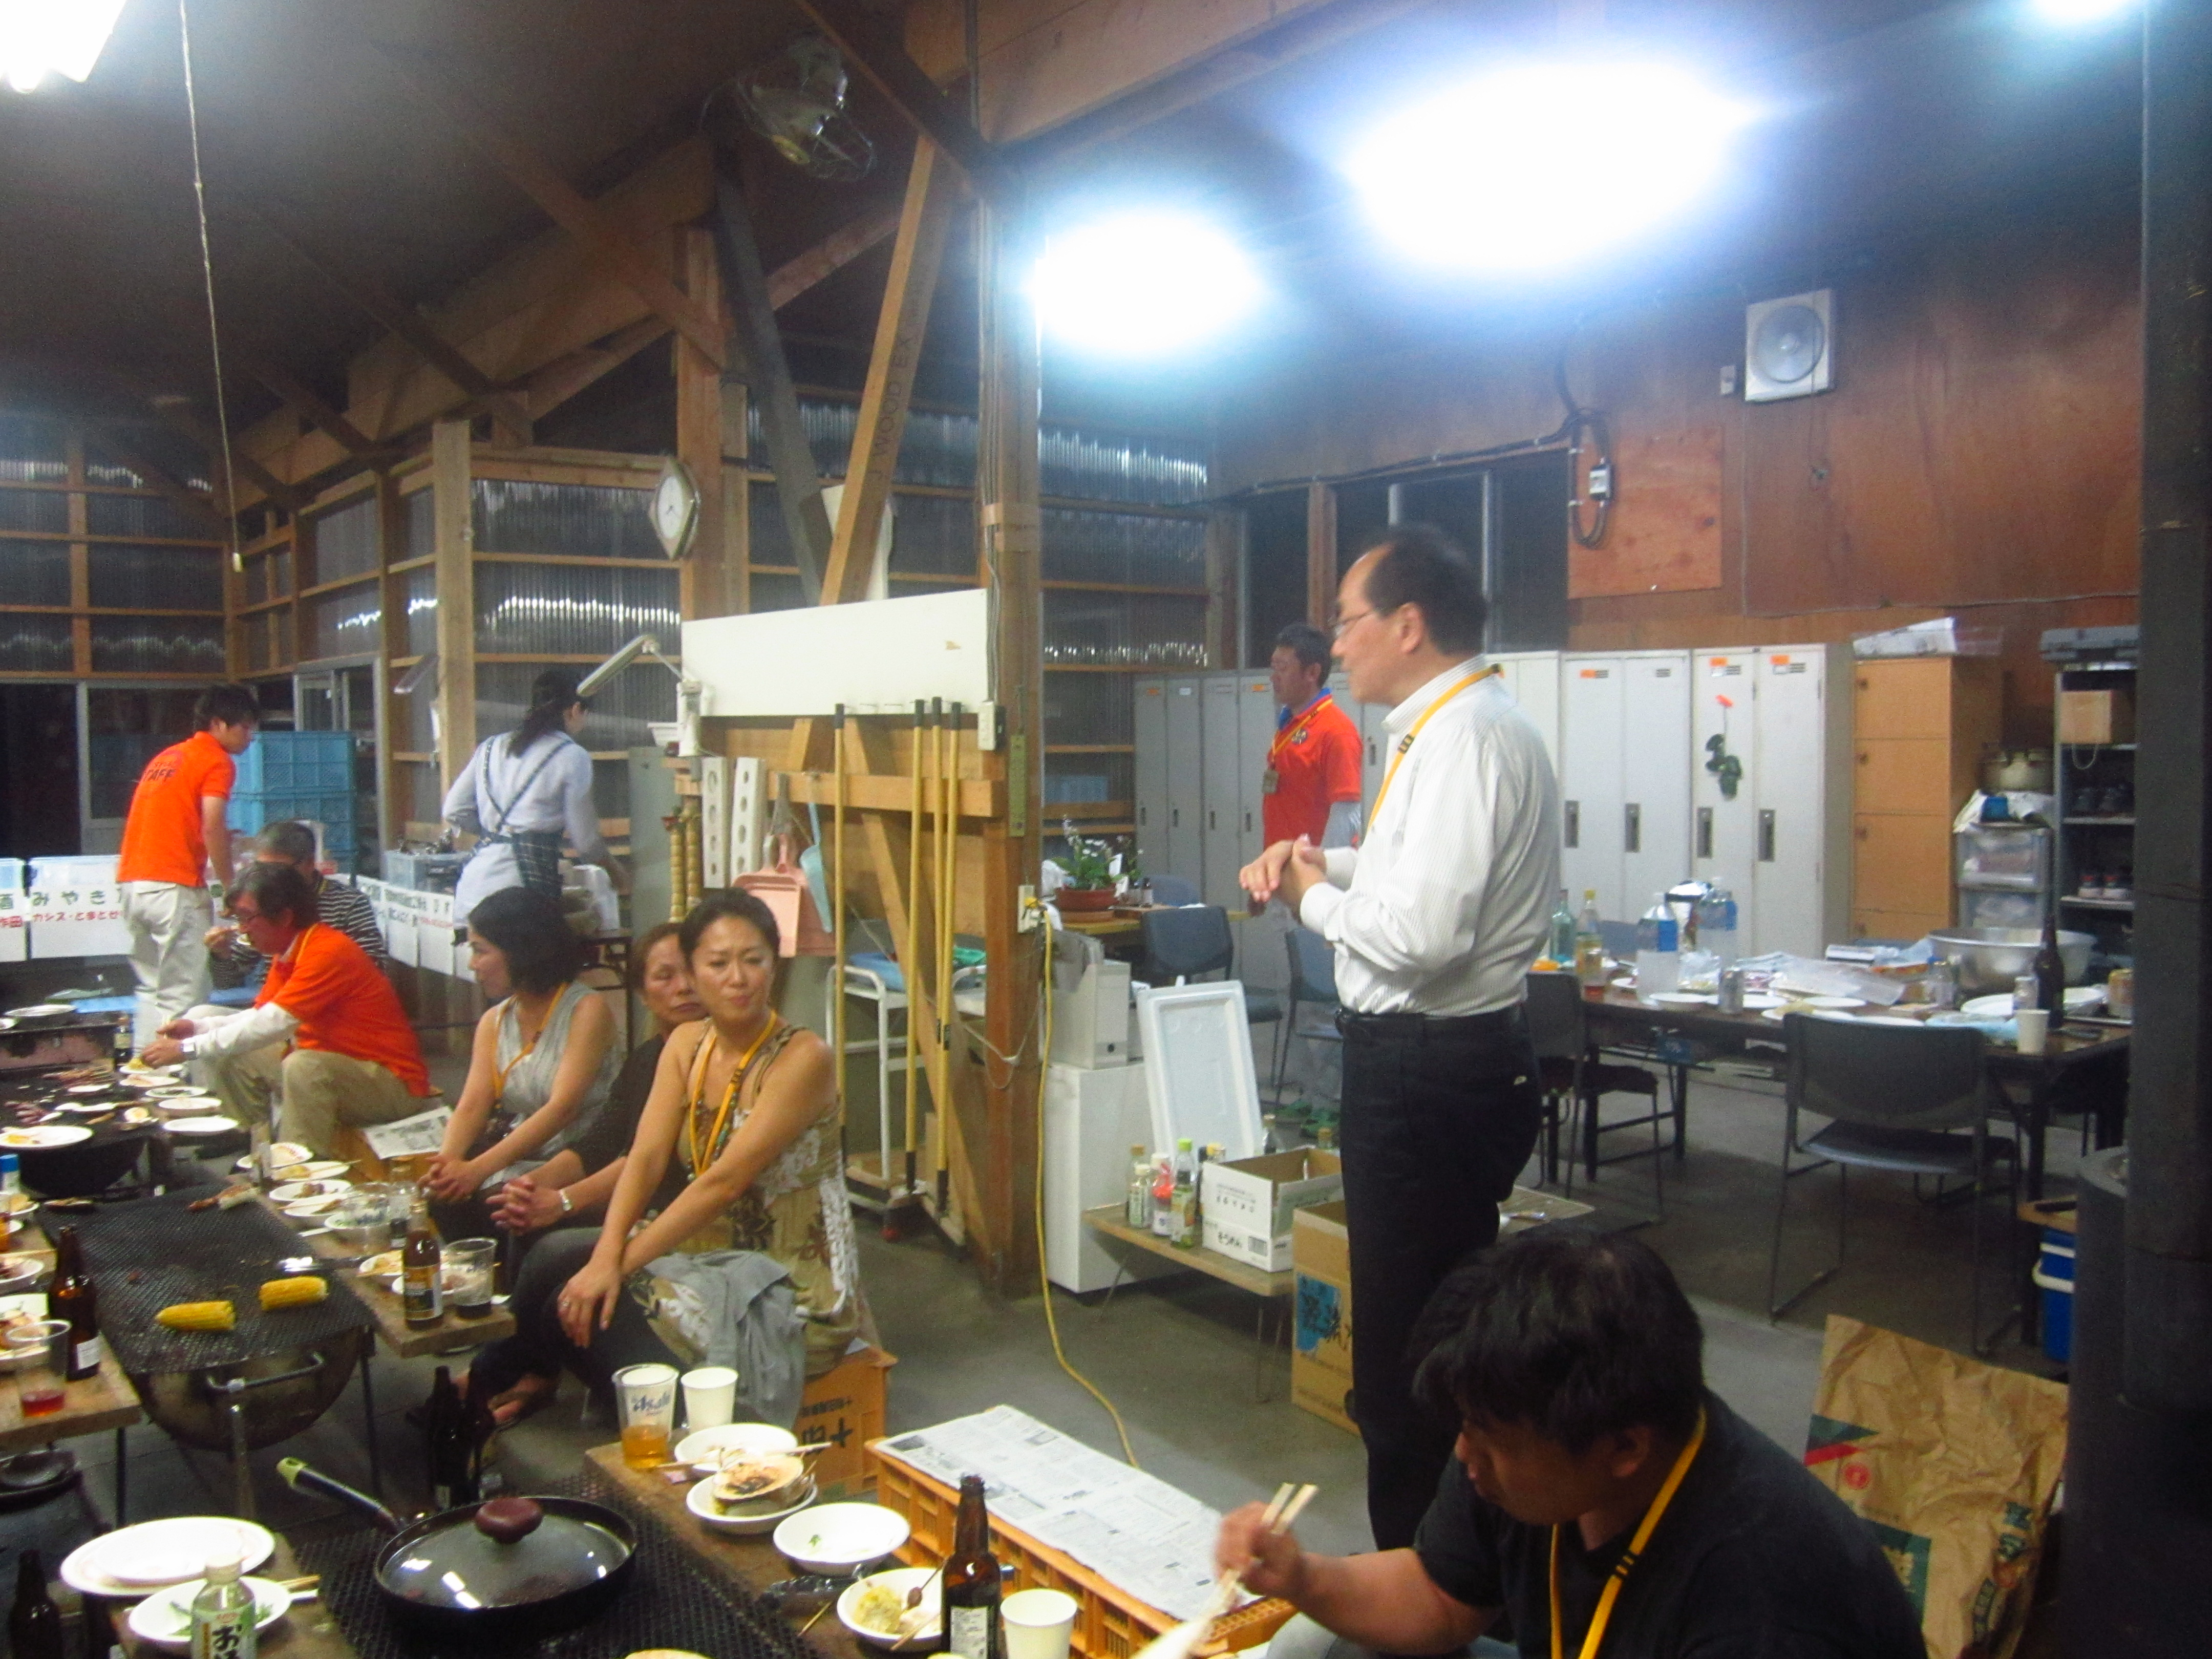 IMG 4340 - 麻布十番納涼祭り25,26日(七戸町出店)